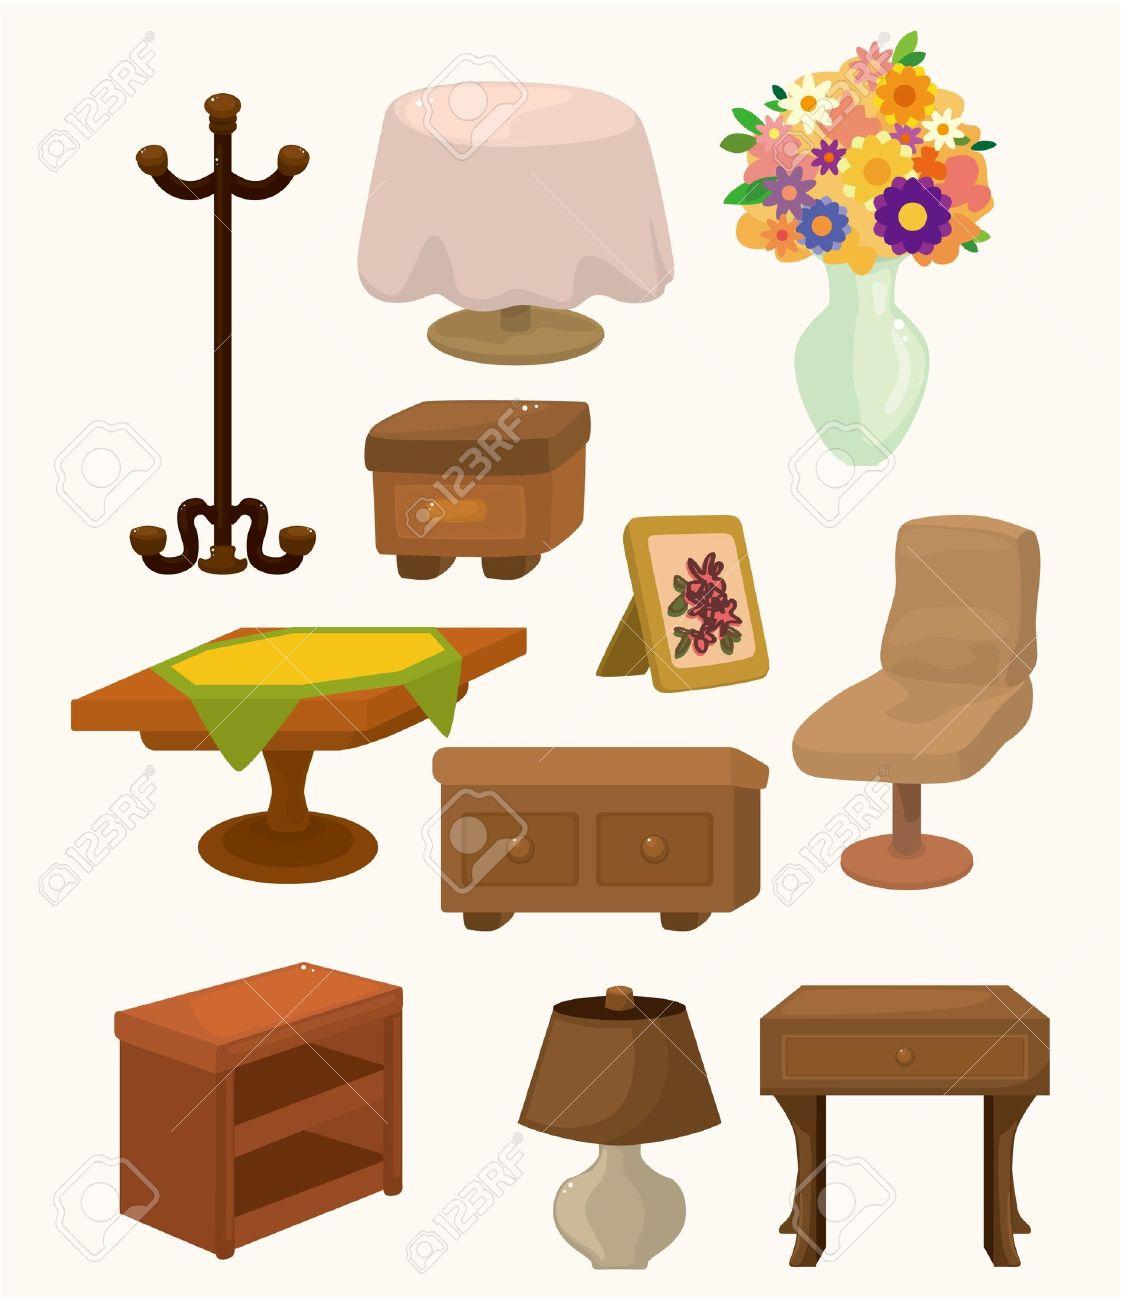 cartoon Furniture icons Stock Vector - 10428816